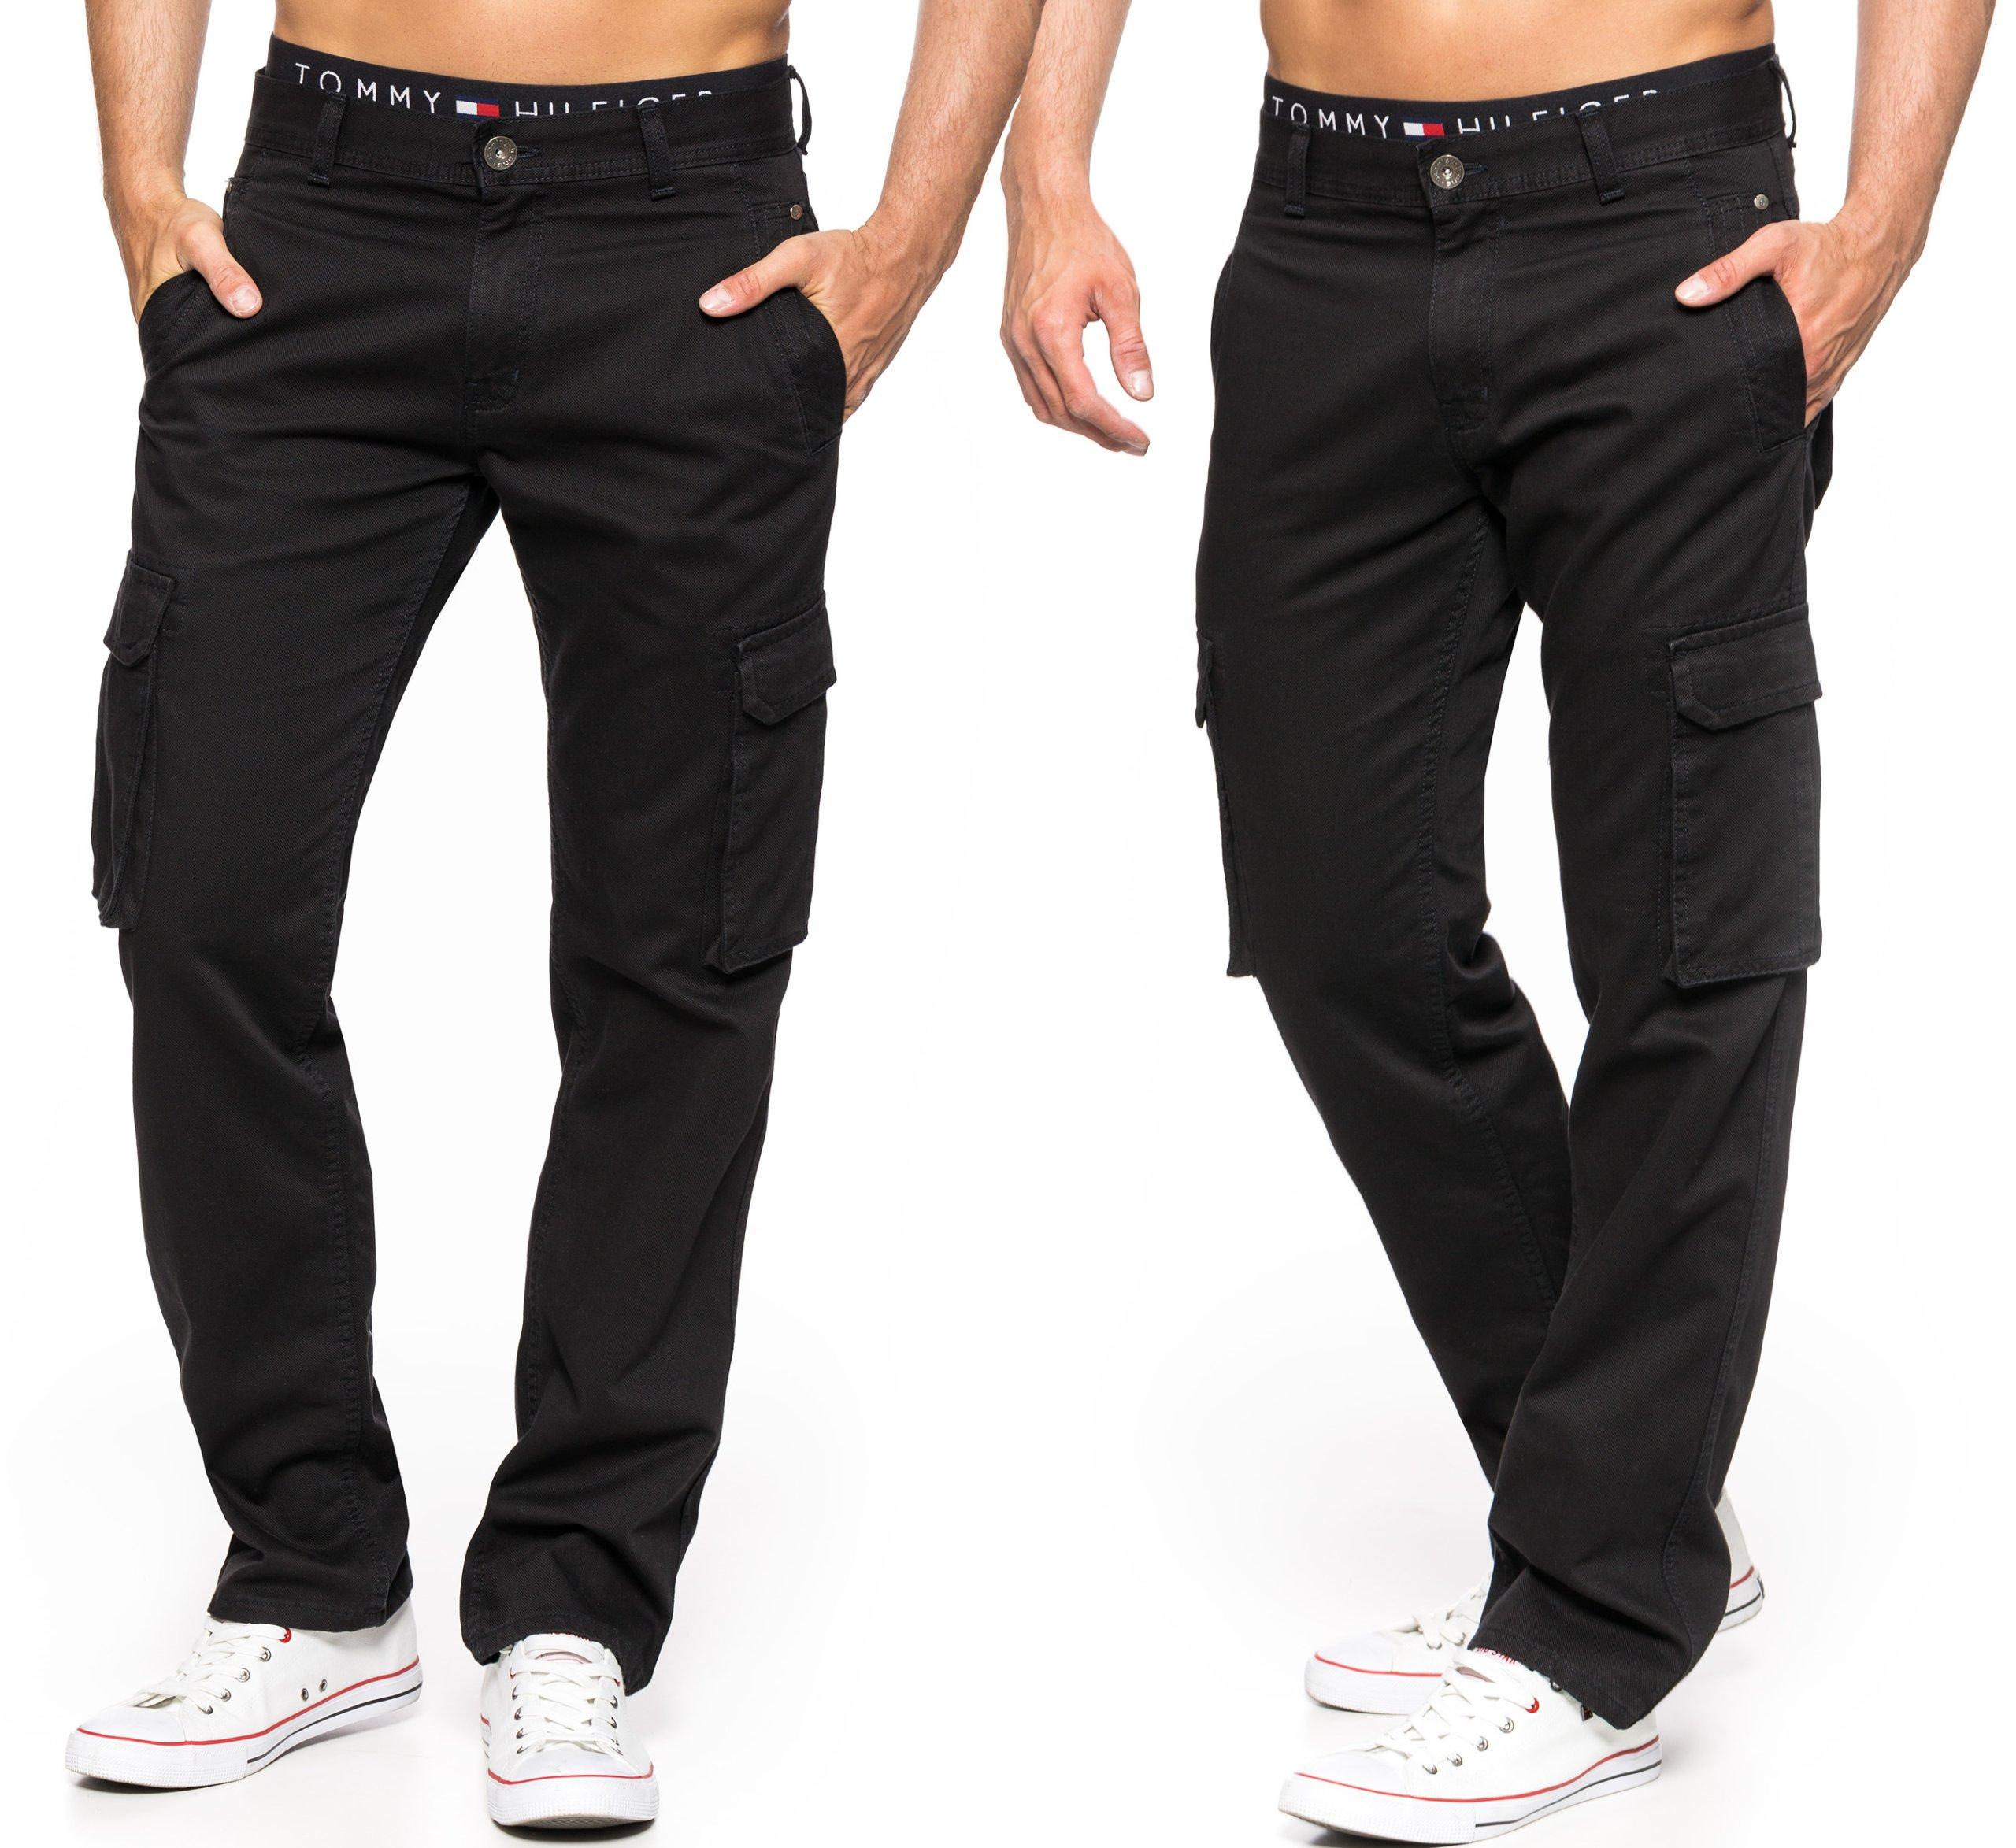 Bojówki Męskie Stanley Jeans Czarne 98cm L33 7331269020 Allegro Pl